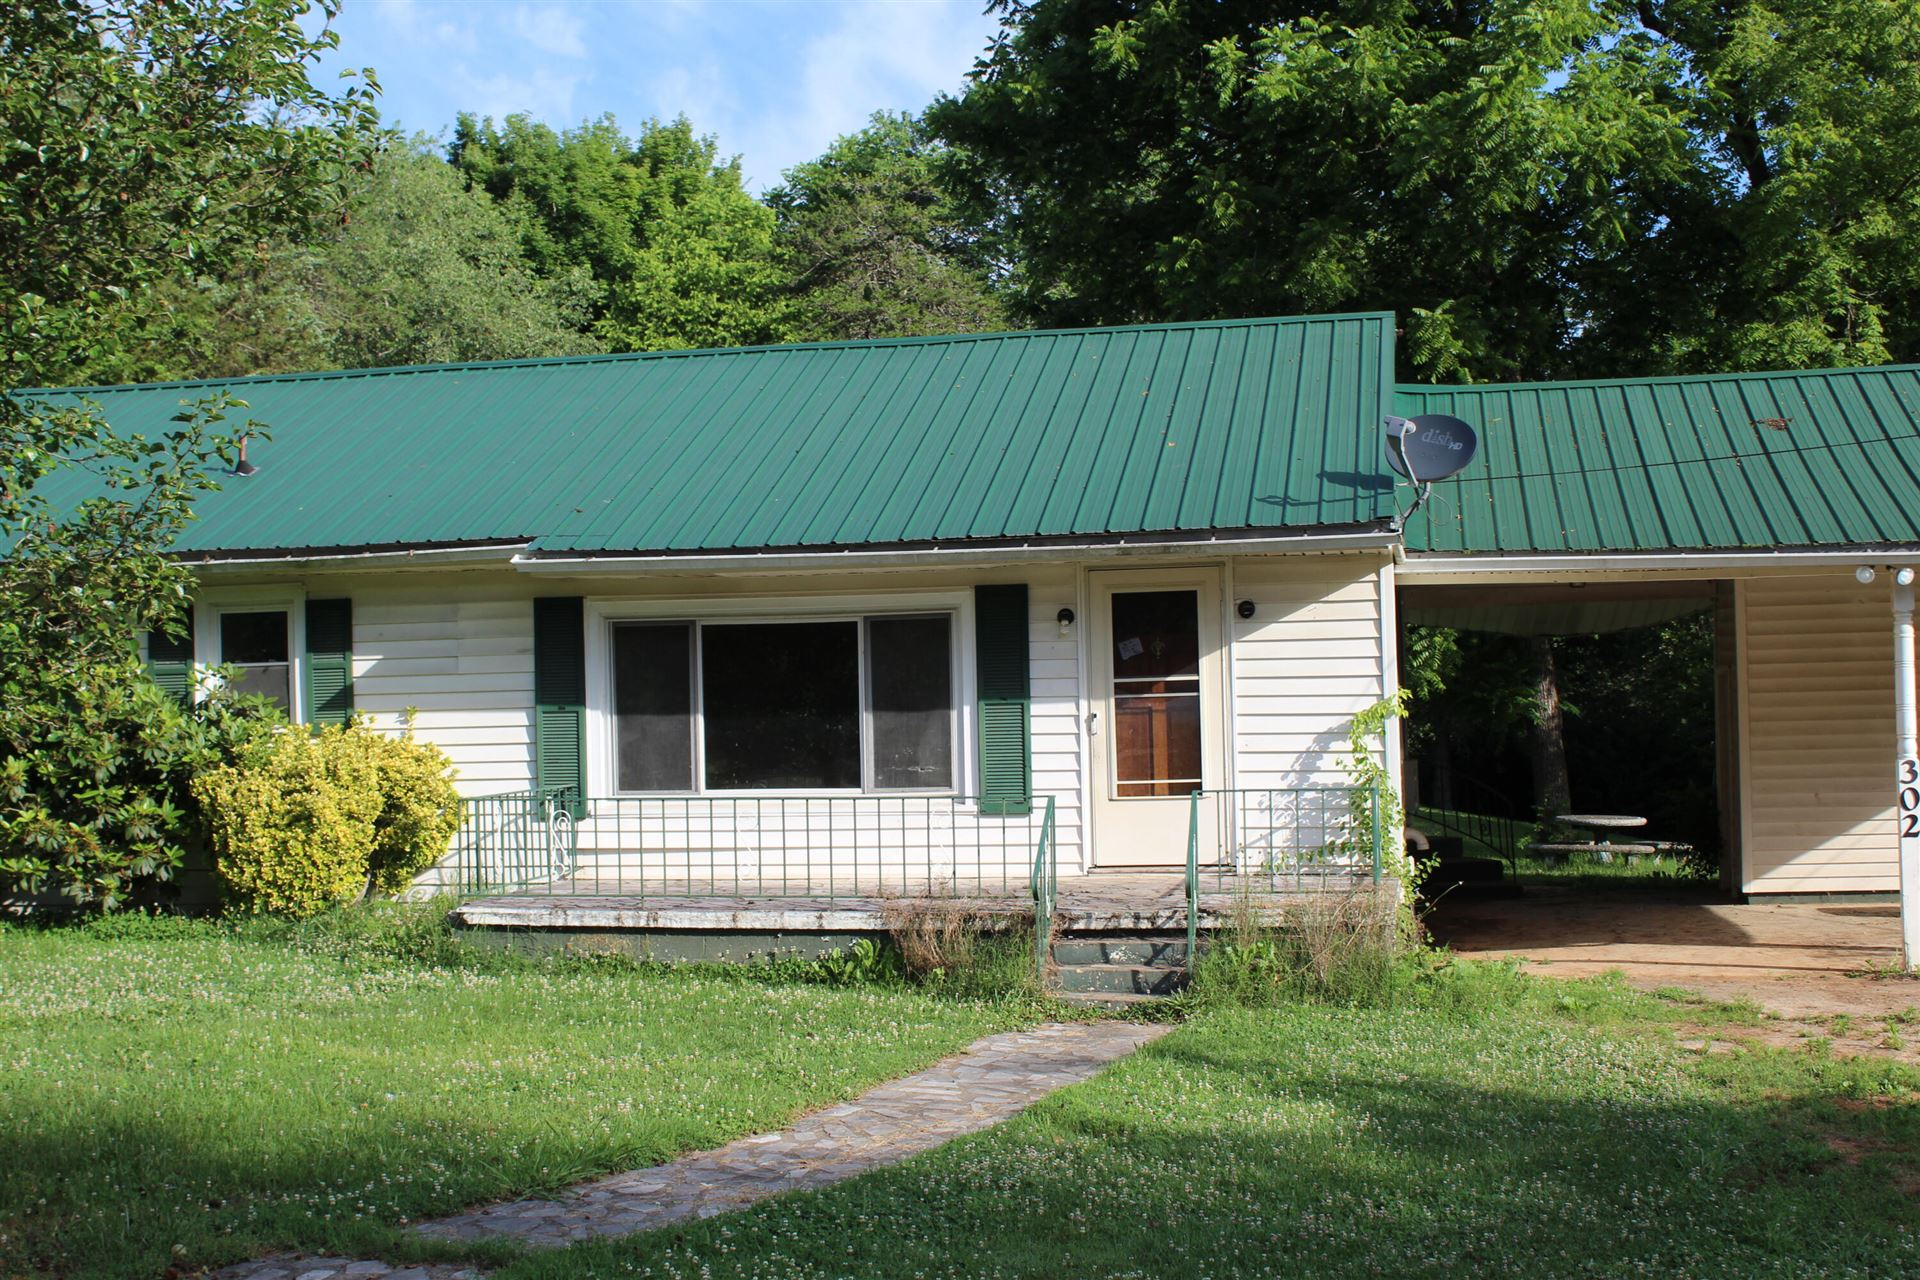 Photo of 302 Nancy Drive, Jefferson City, TN 37760 (MLS # 1156910)